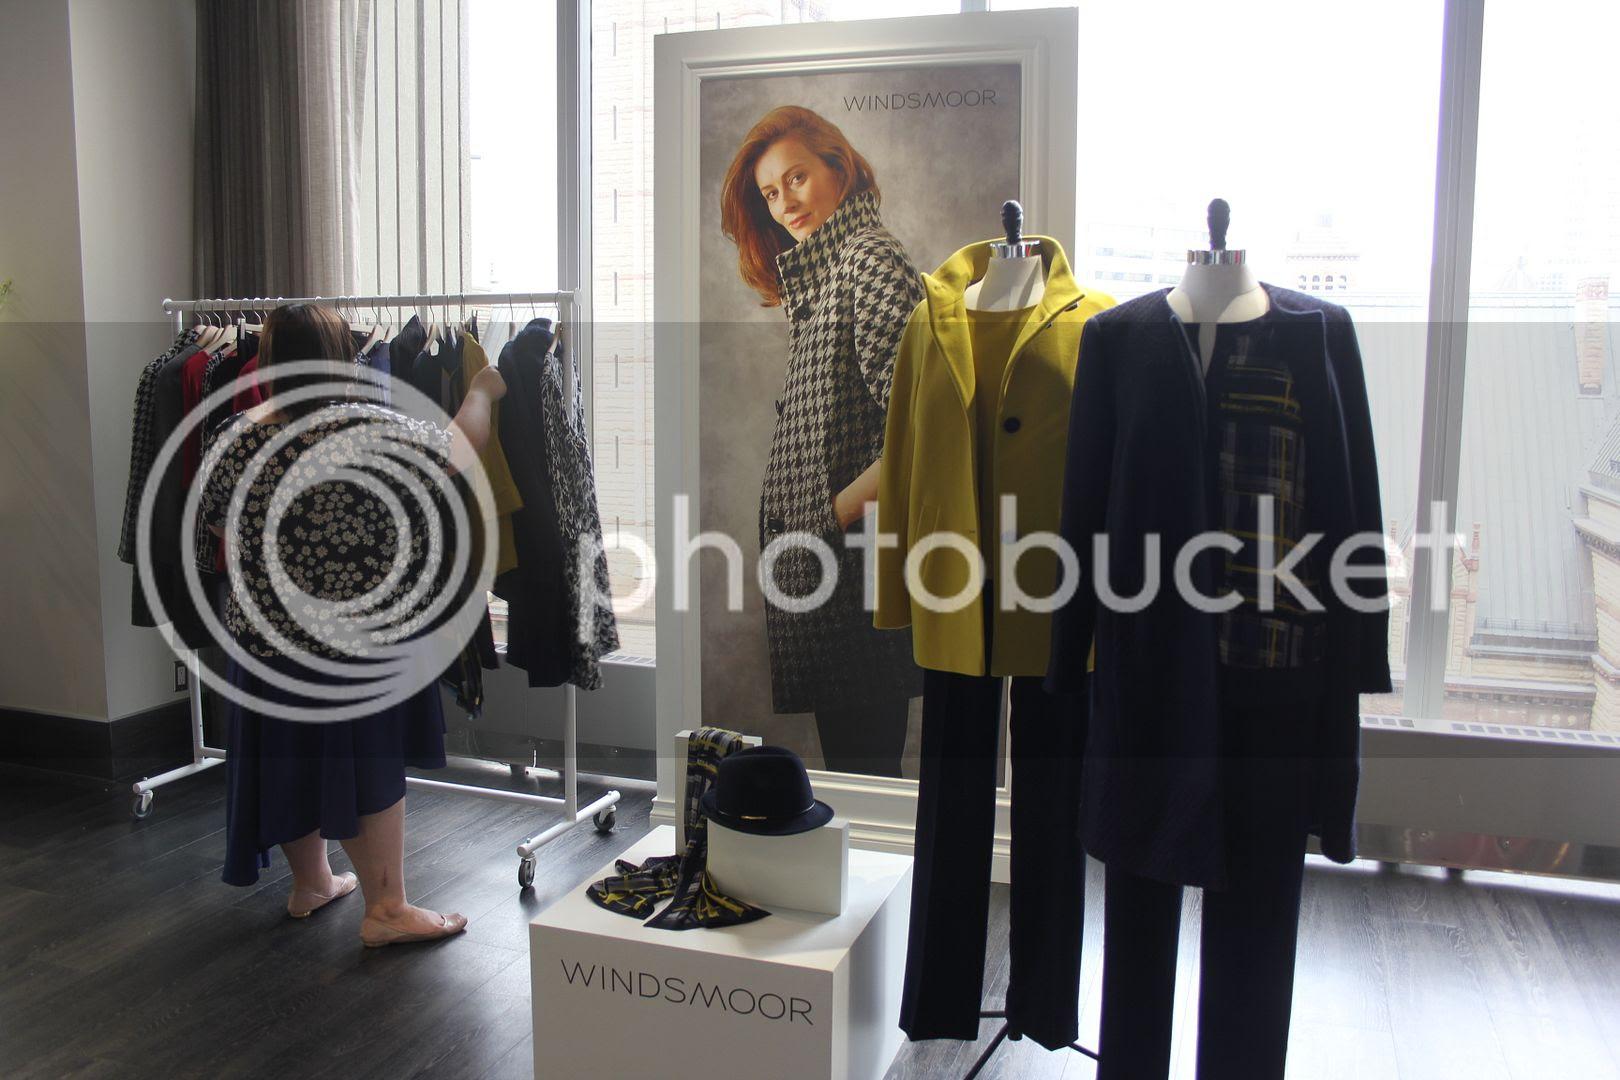 windsmoor jacques vert british brands hudson bay winter 2015 preview planet precis minuet petite plus size fashion